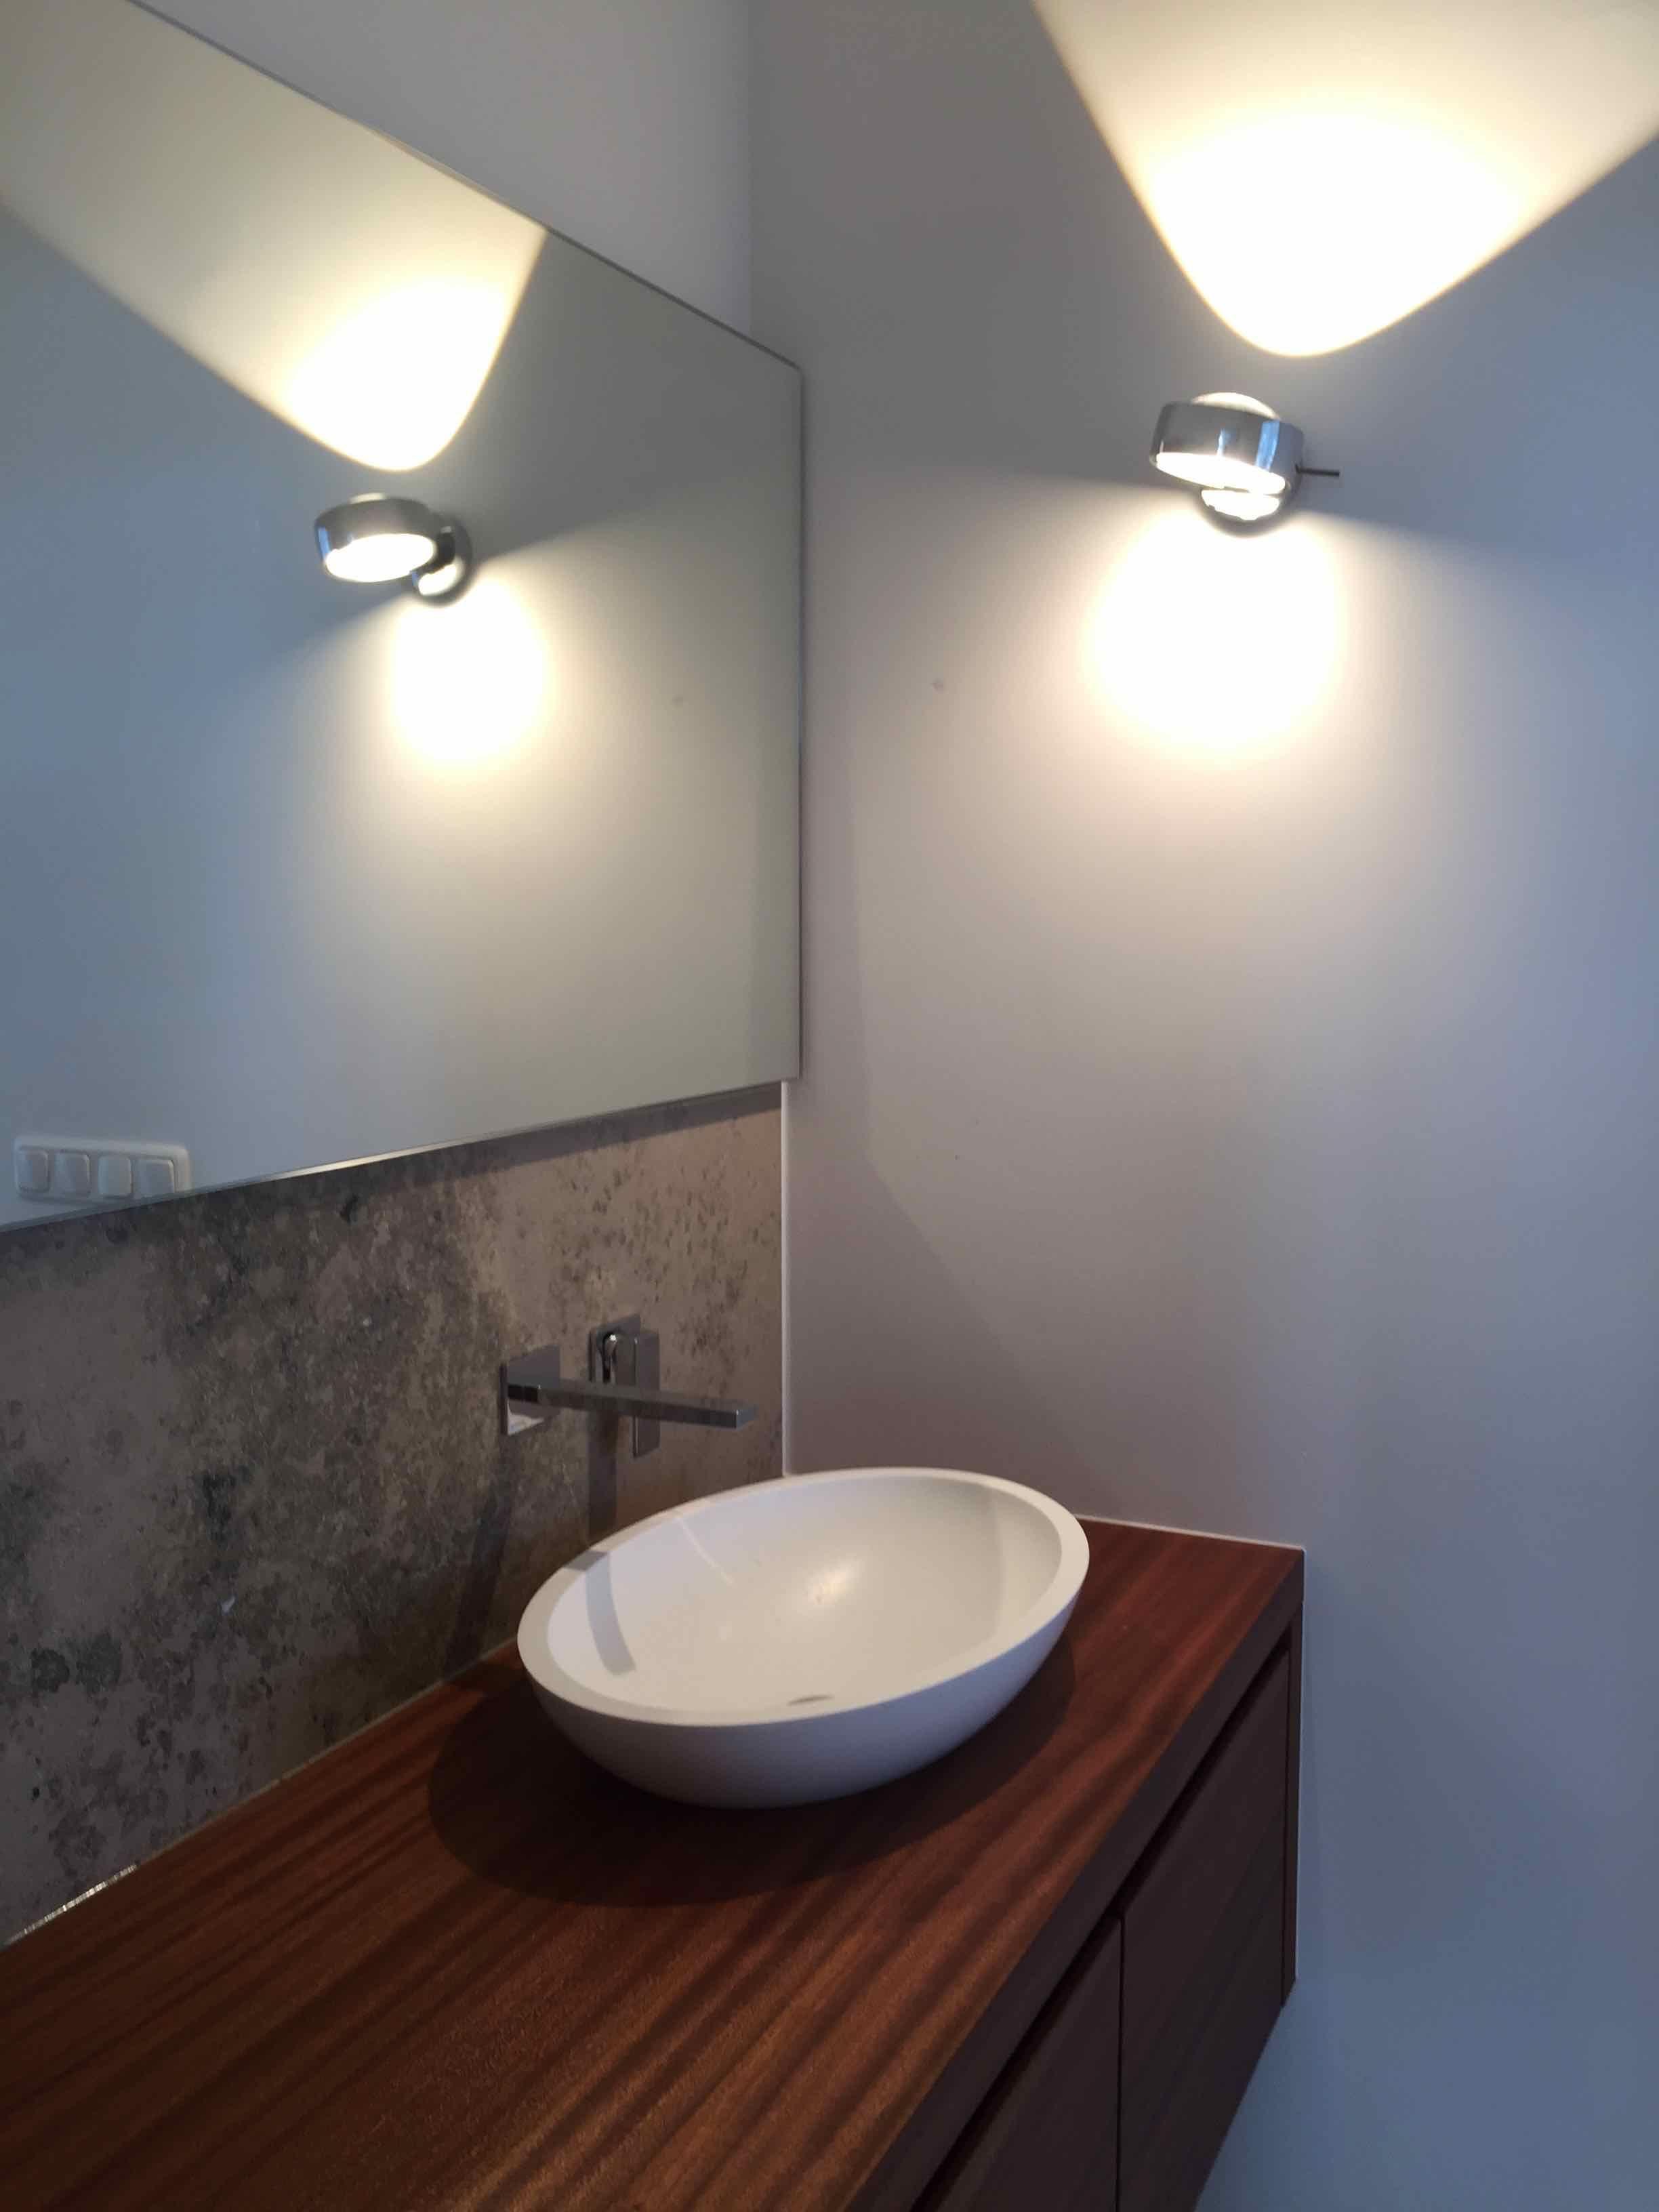 Waschtisch Teakholz Indirekte Beleuchtung Occhio Lampen Lampen Wohnzimmer Beleuchtung Lampe